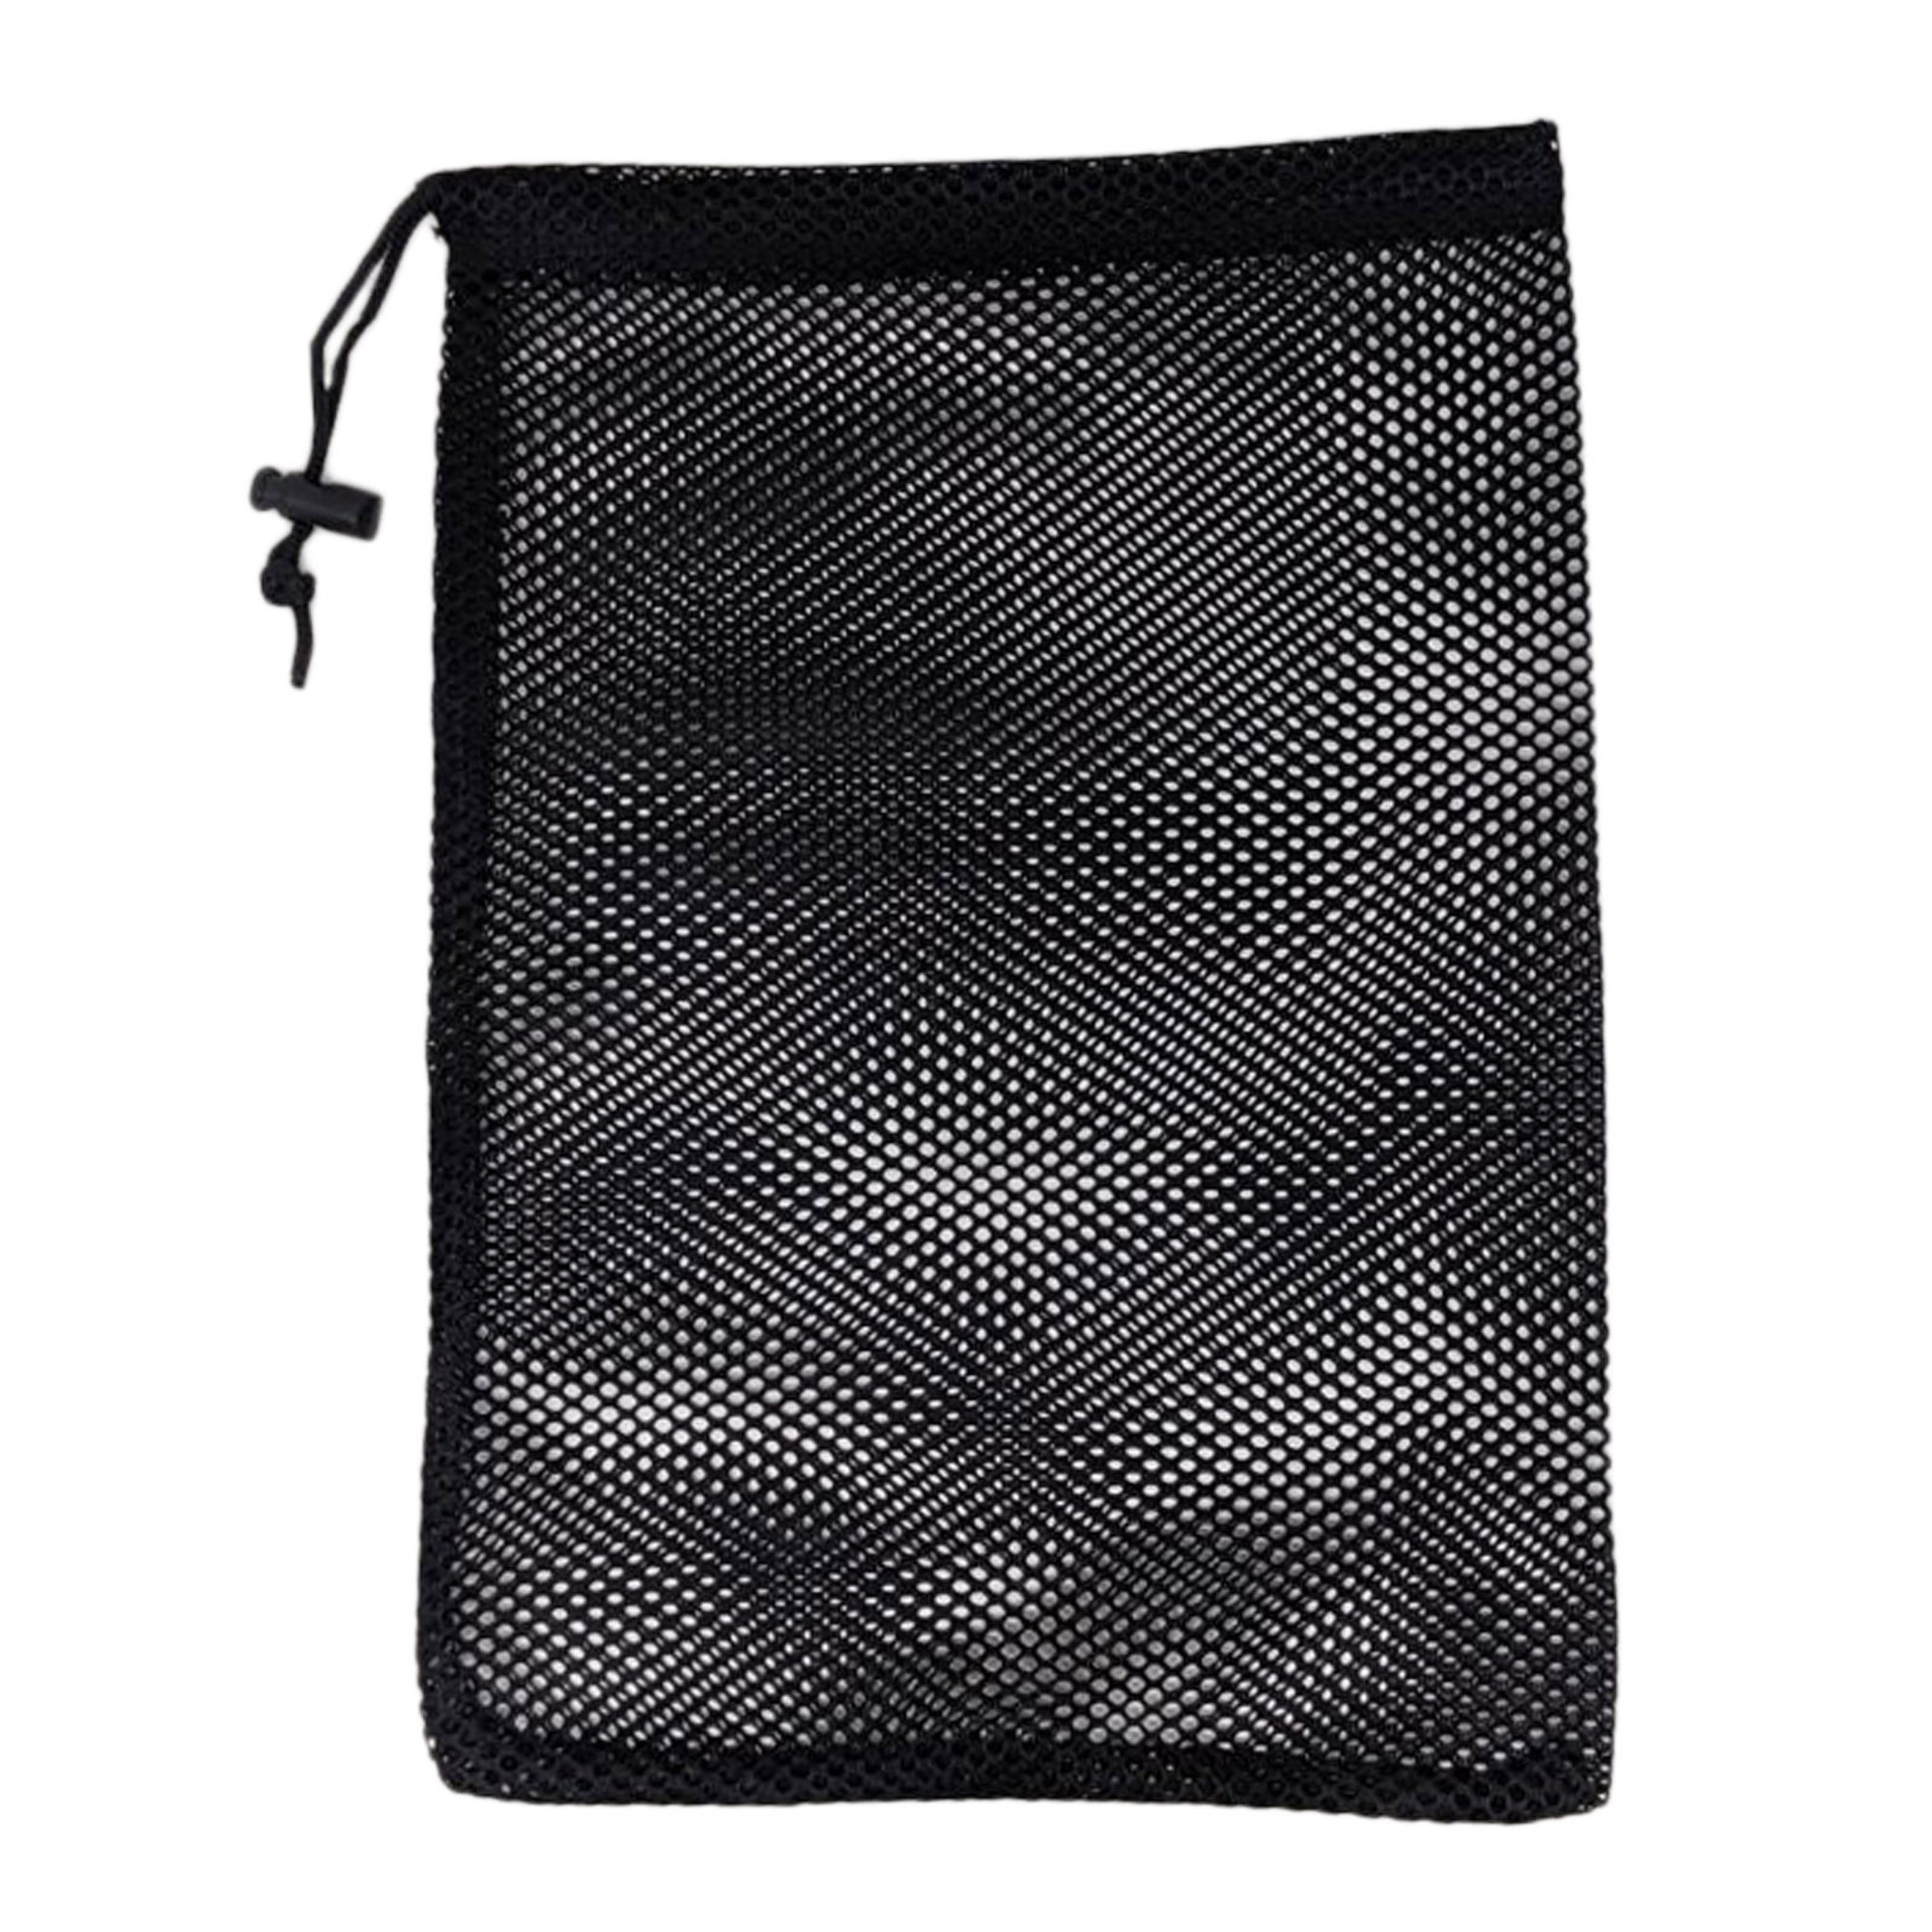 Mesh Full Face Mask Drawstring Bag